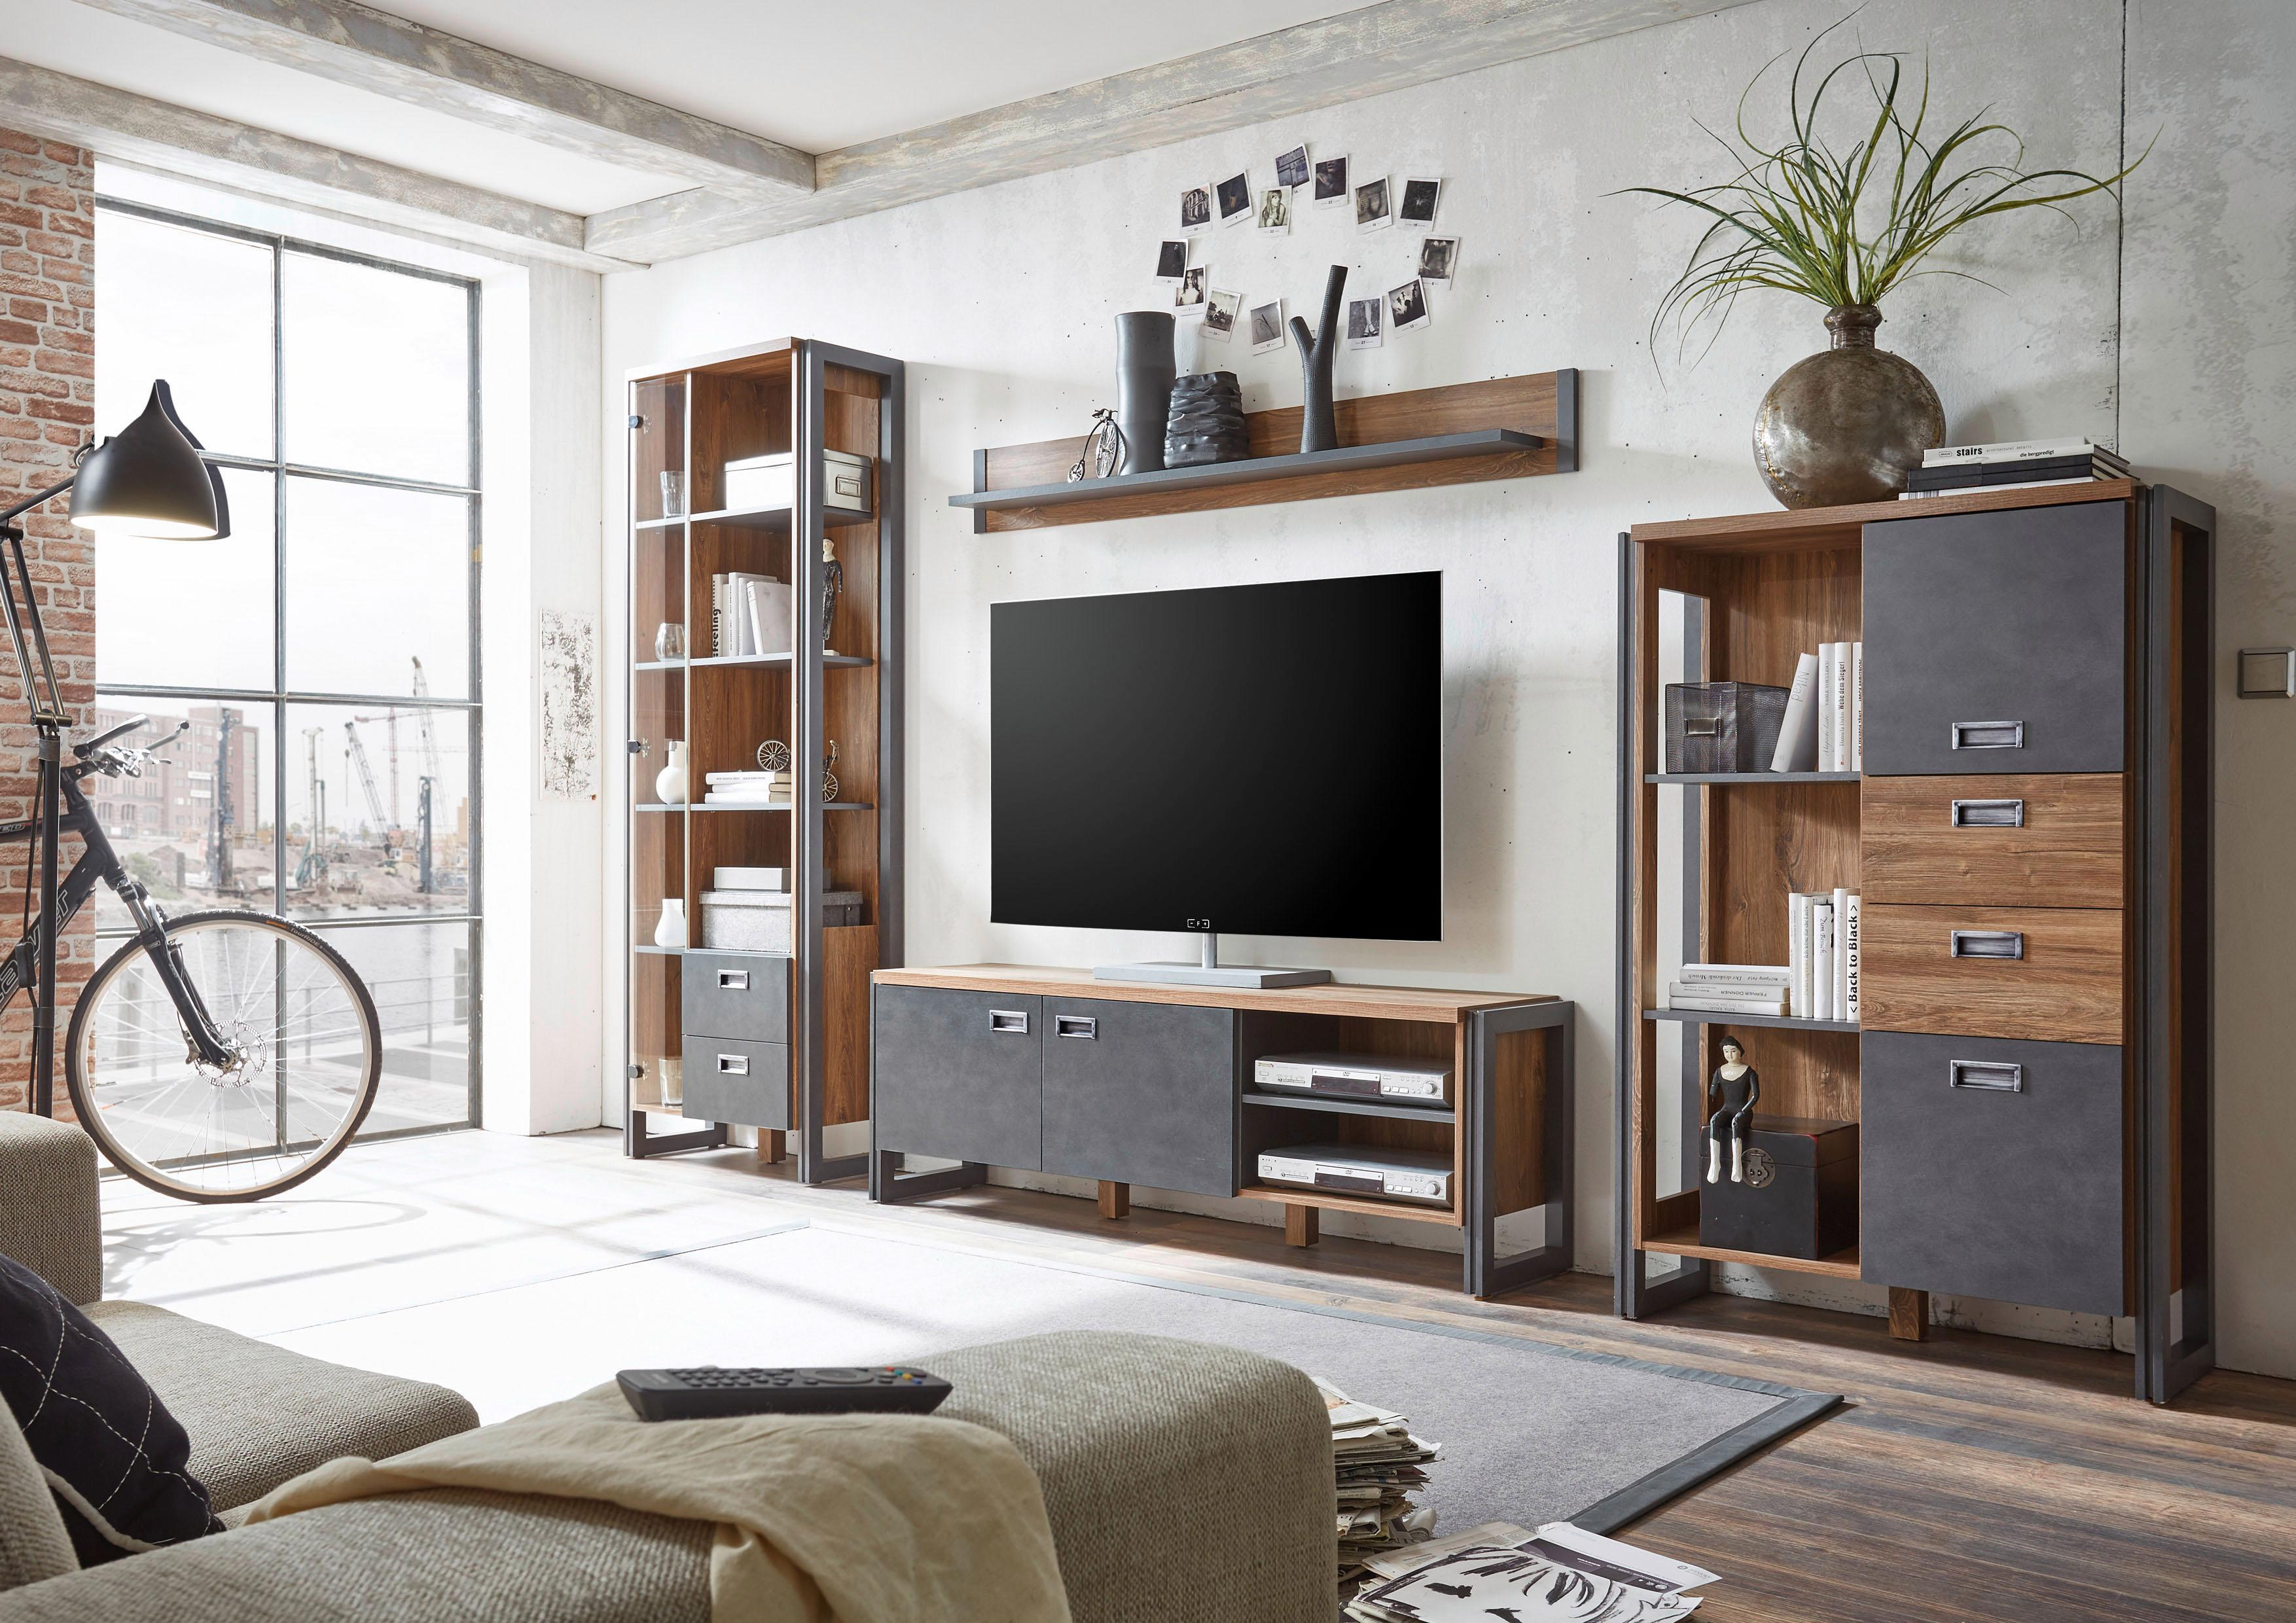 Home affaire Wohnwand Detroit Set 4 (Set 4-tlg)